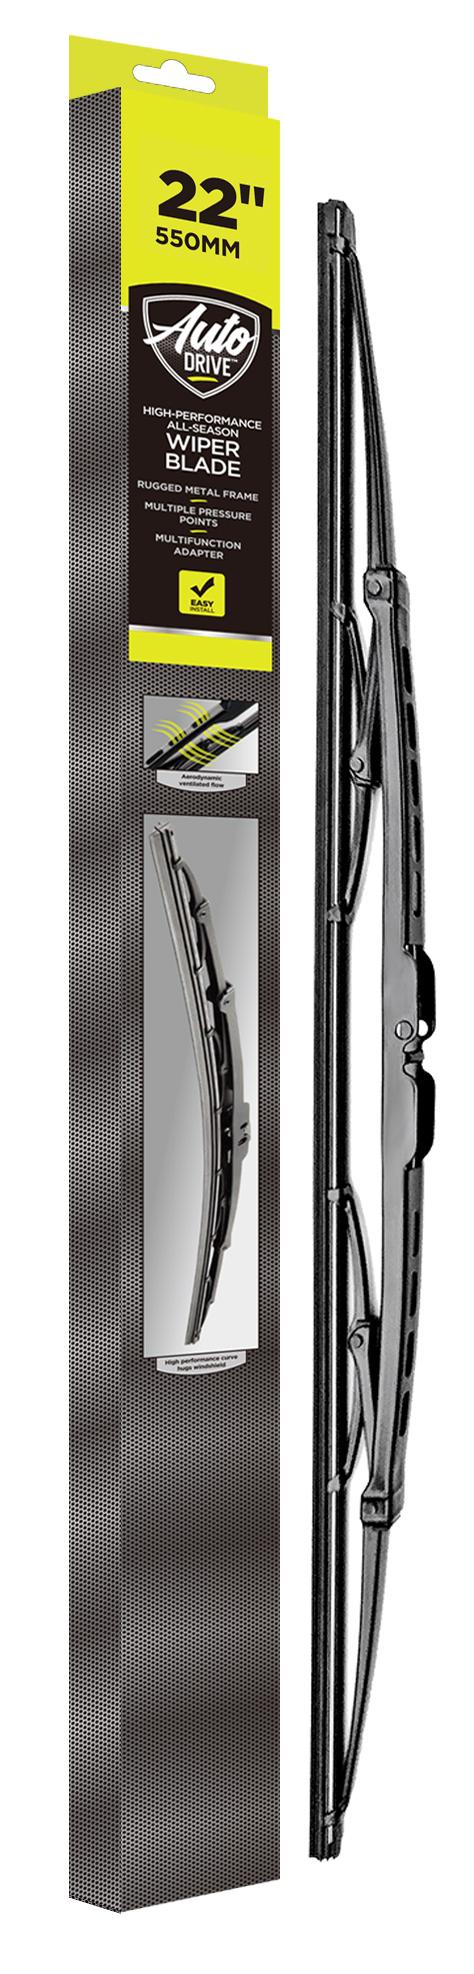 Set of 2 Online Automotive WBVLCOR14 7001 Front Standard Windscreen Wiper Blades